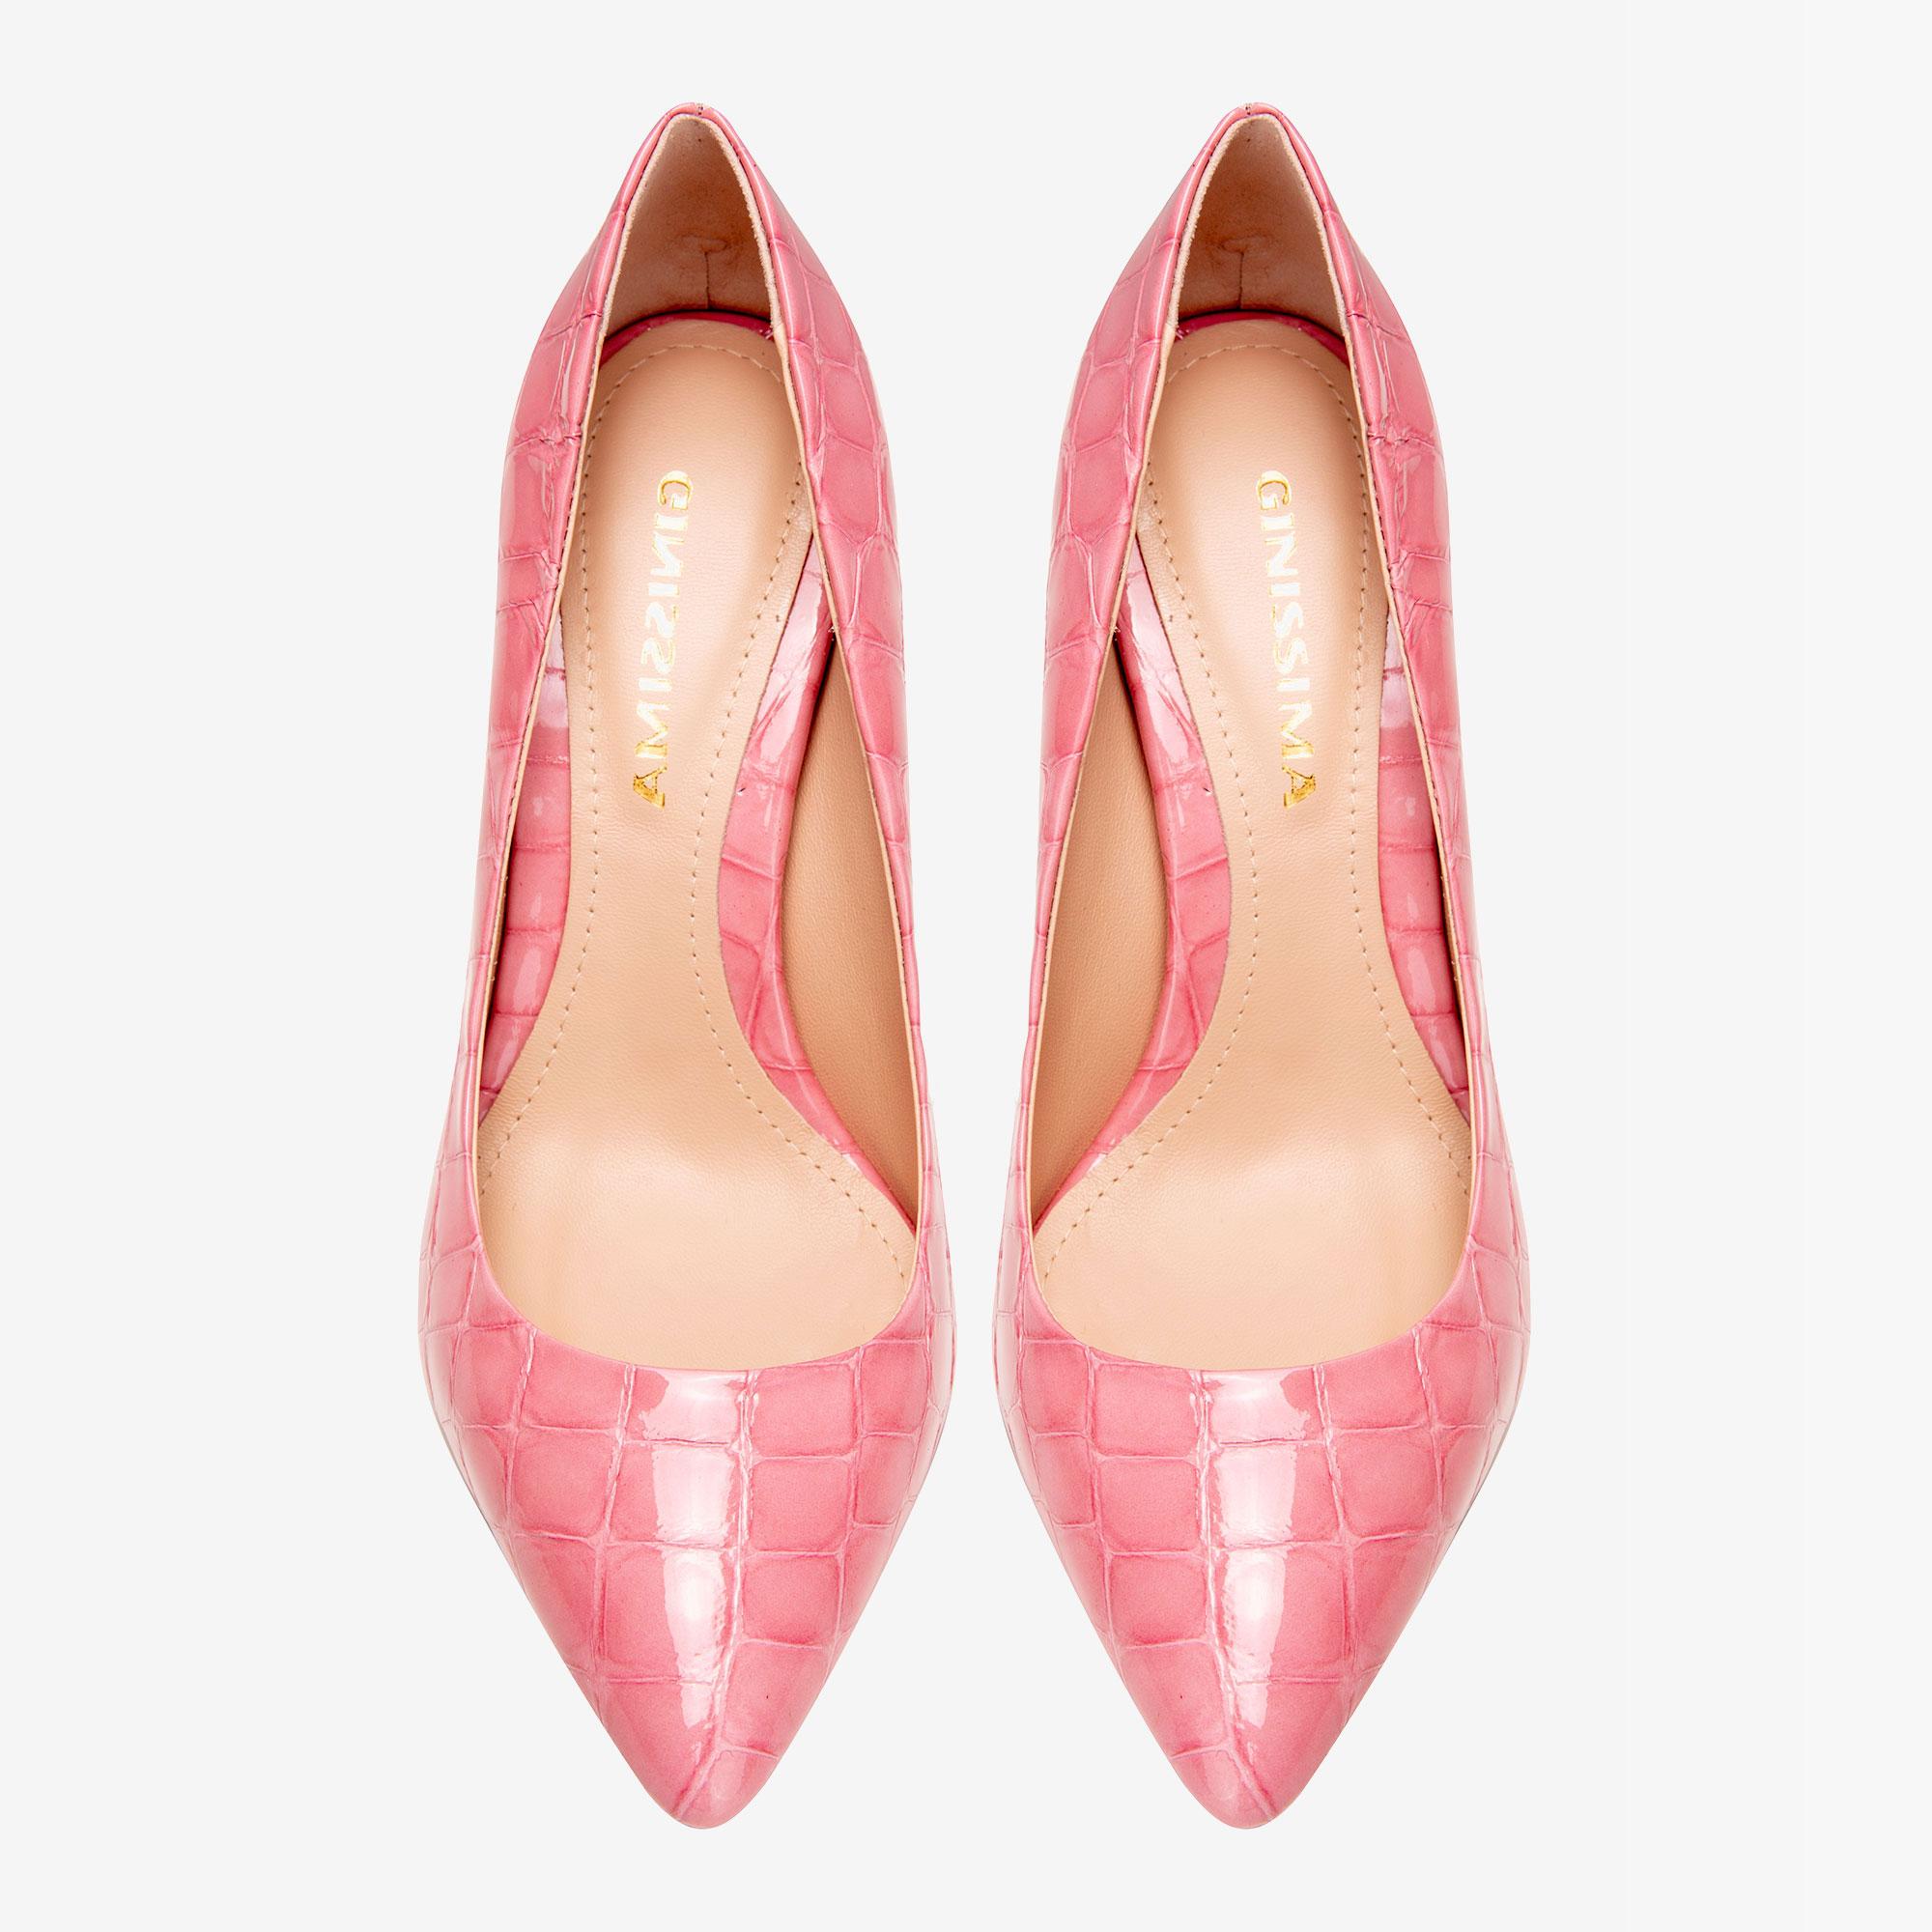 Pantofi cu varf ascutit din piele croco roz Ginissima imagine 2